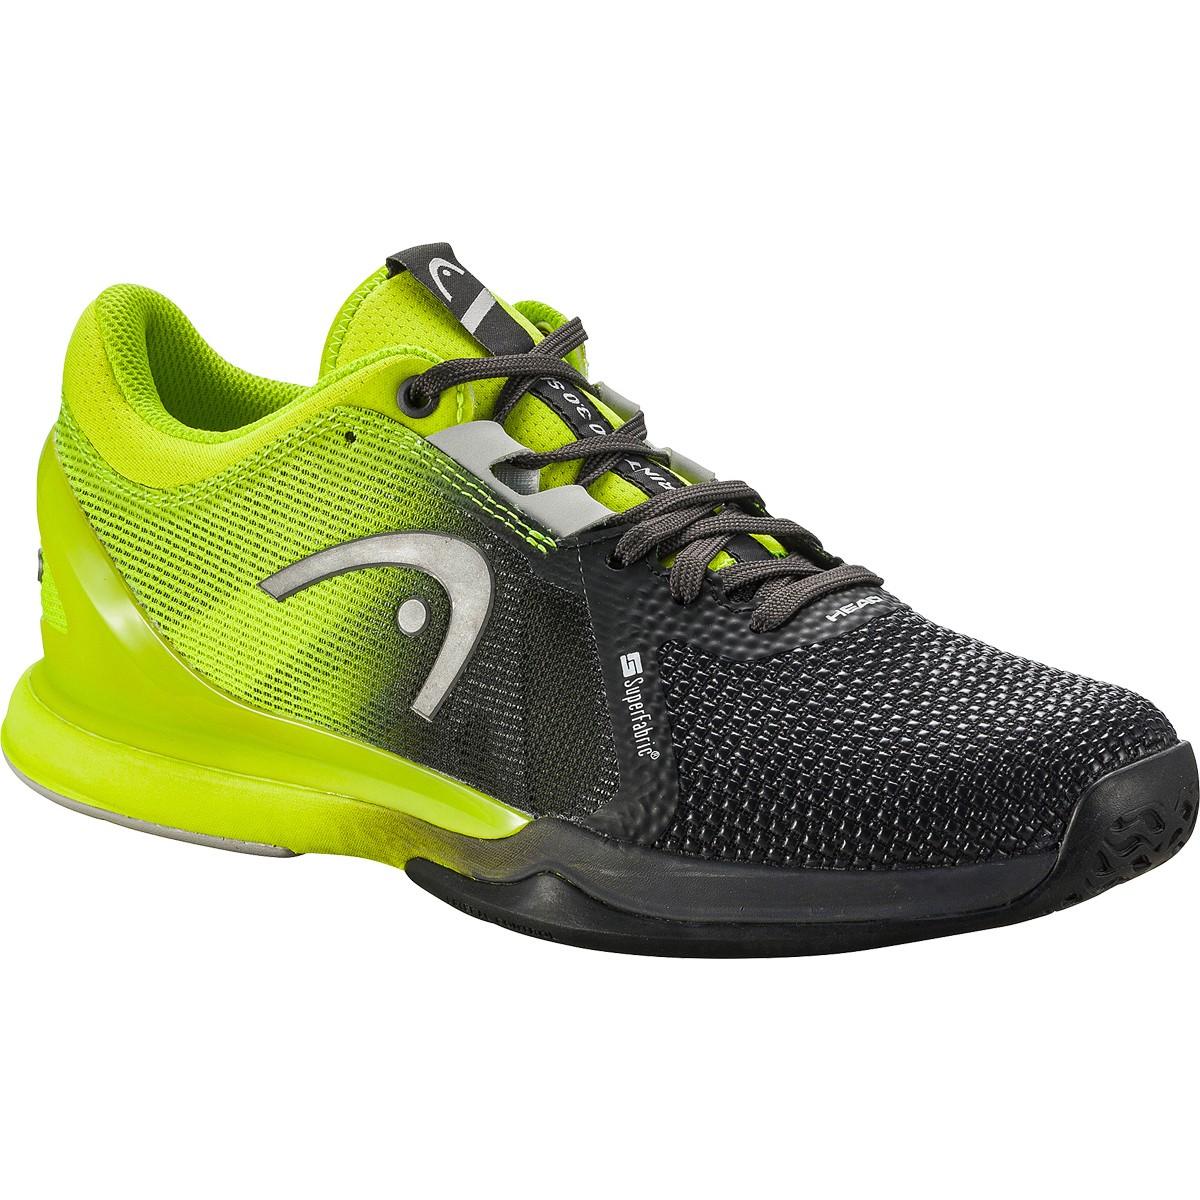 Chaussures Head Femme Sprint Pro 3.0 Superfabric Toutes Surfaces